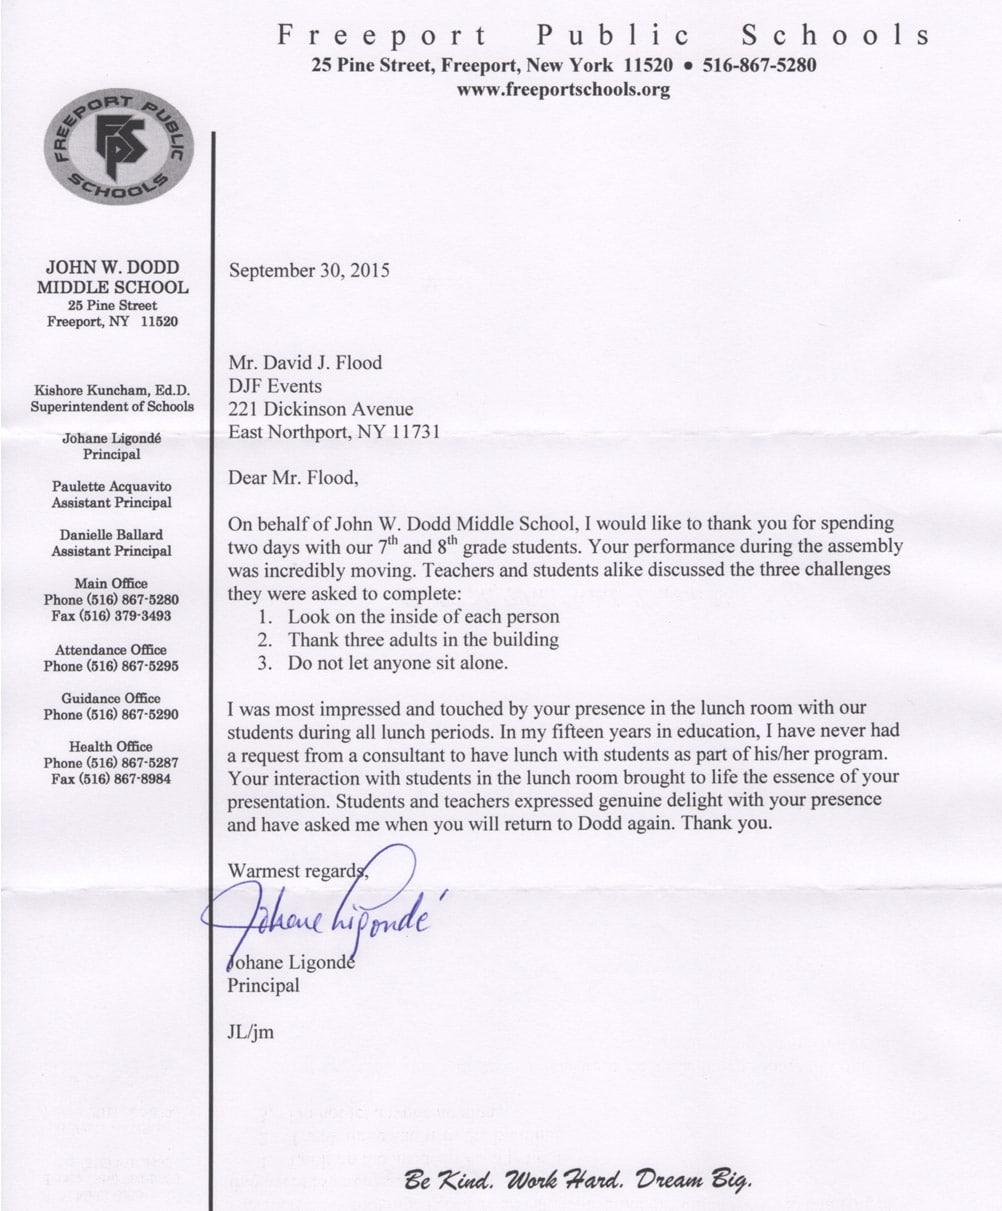 Freeport Public School - John W Dodd Middle School - New York